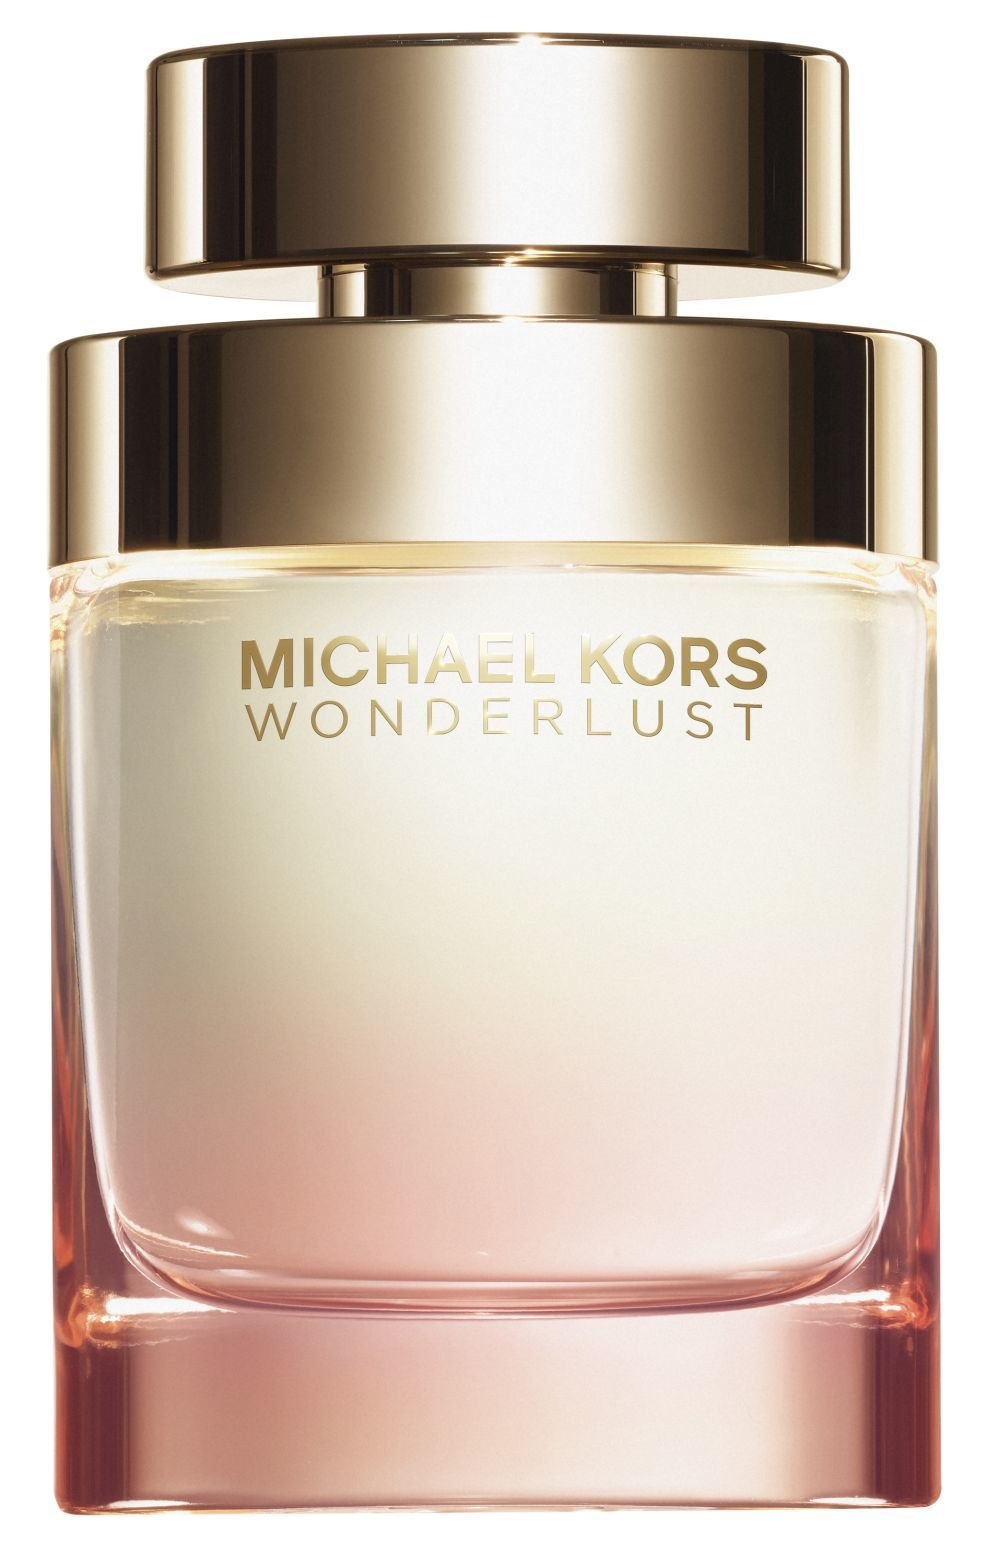 Michael Kors Wonderlust, la nueva fragancia de Michael Kors.